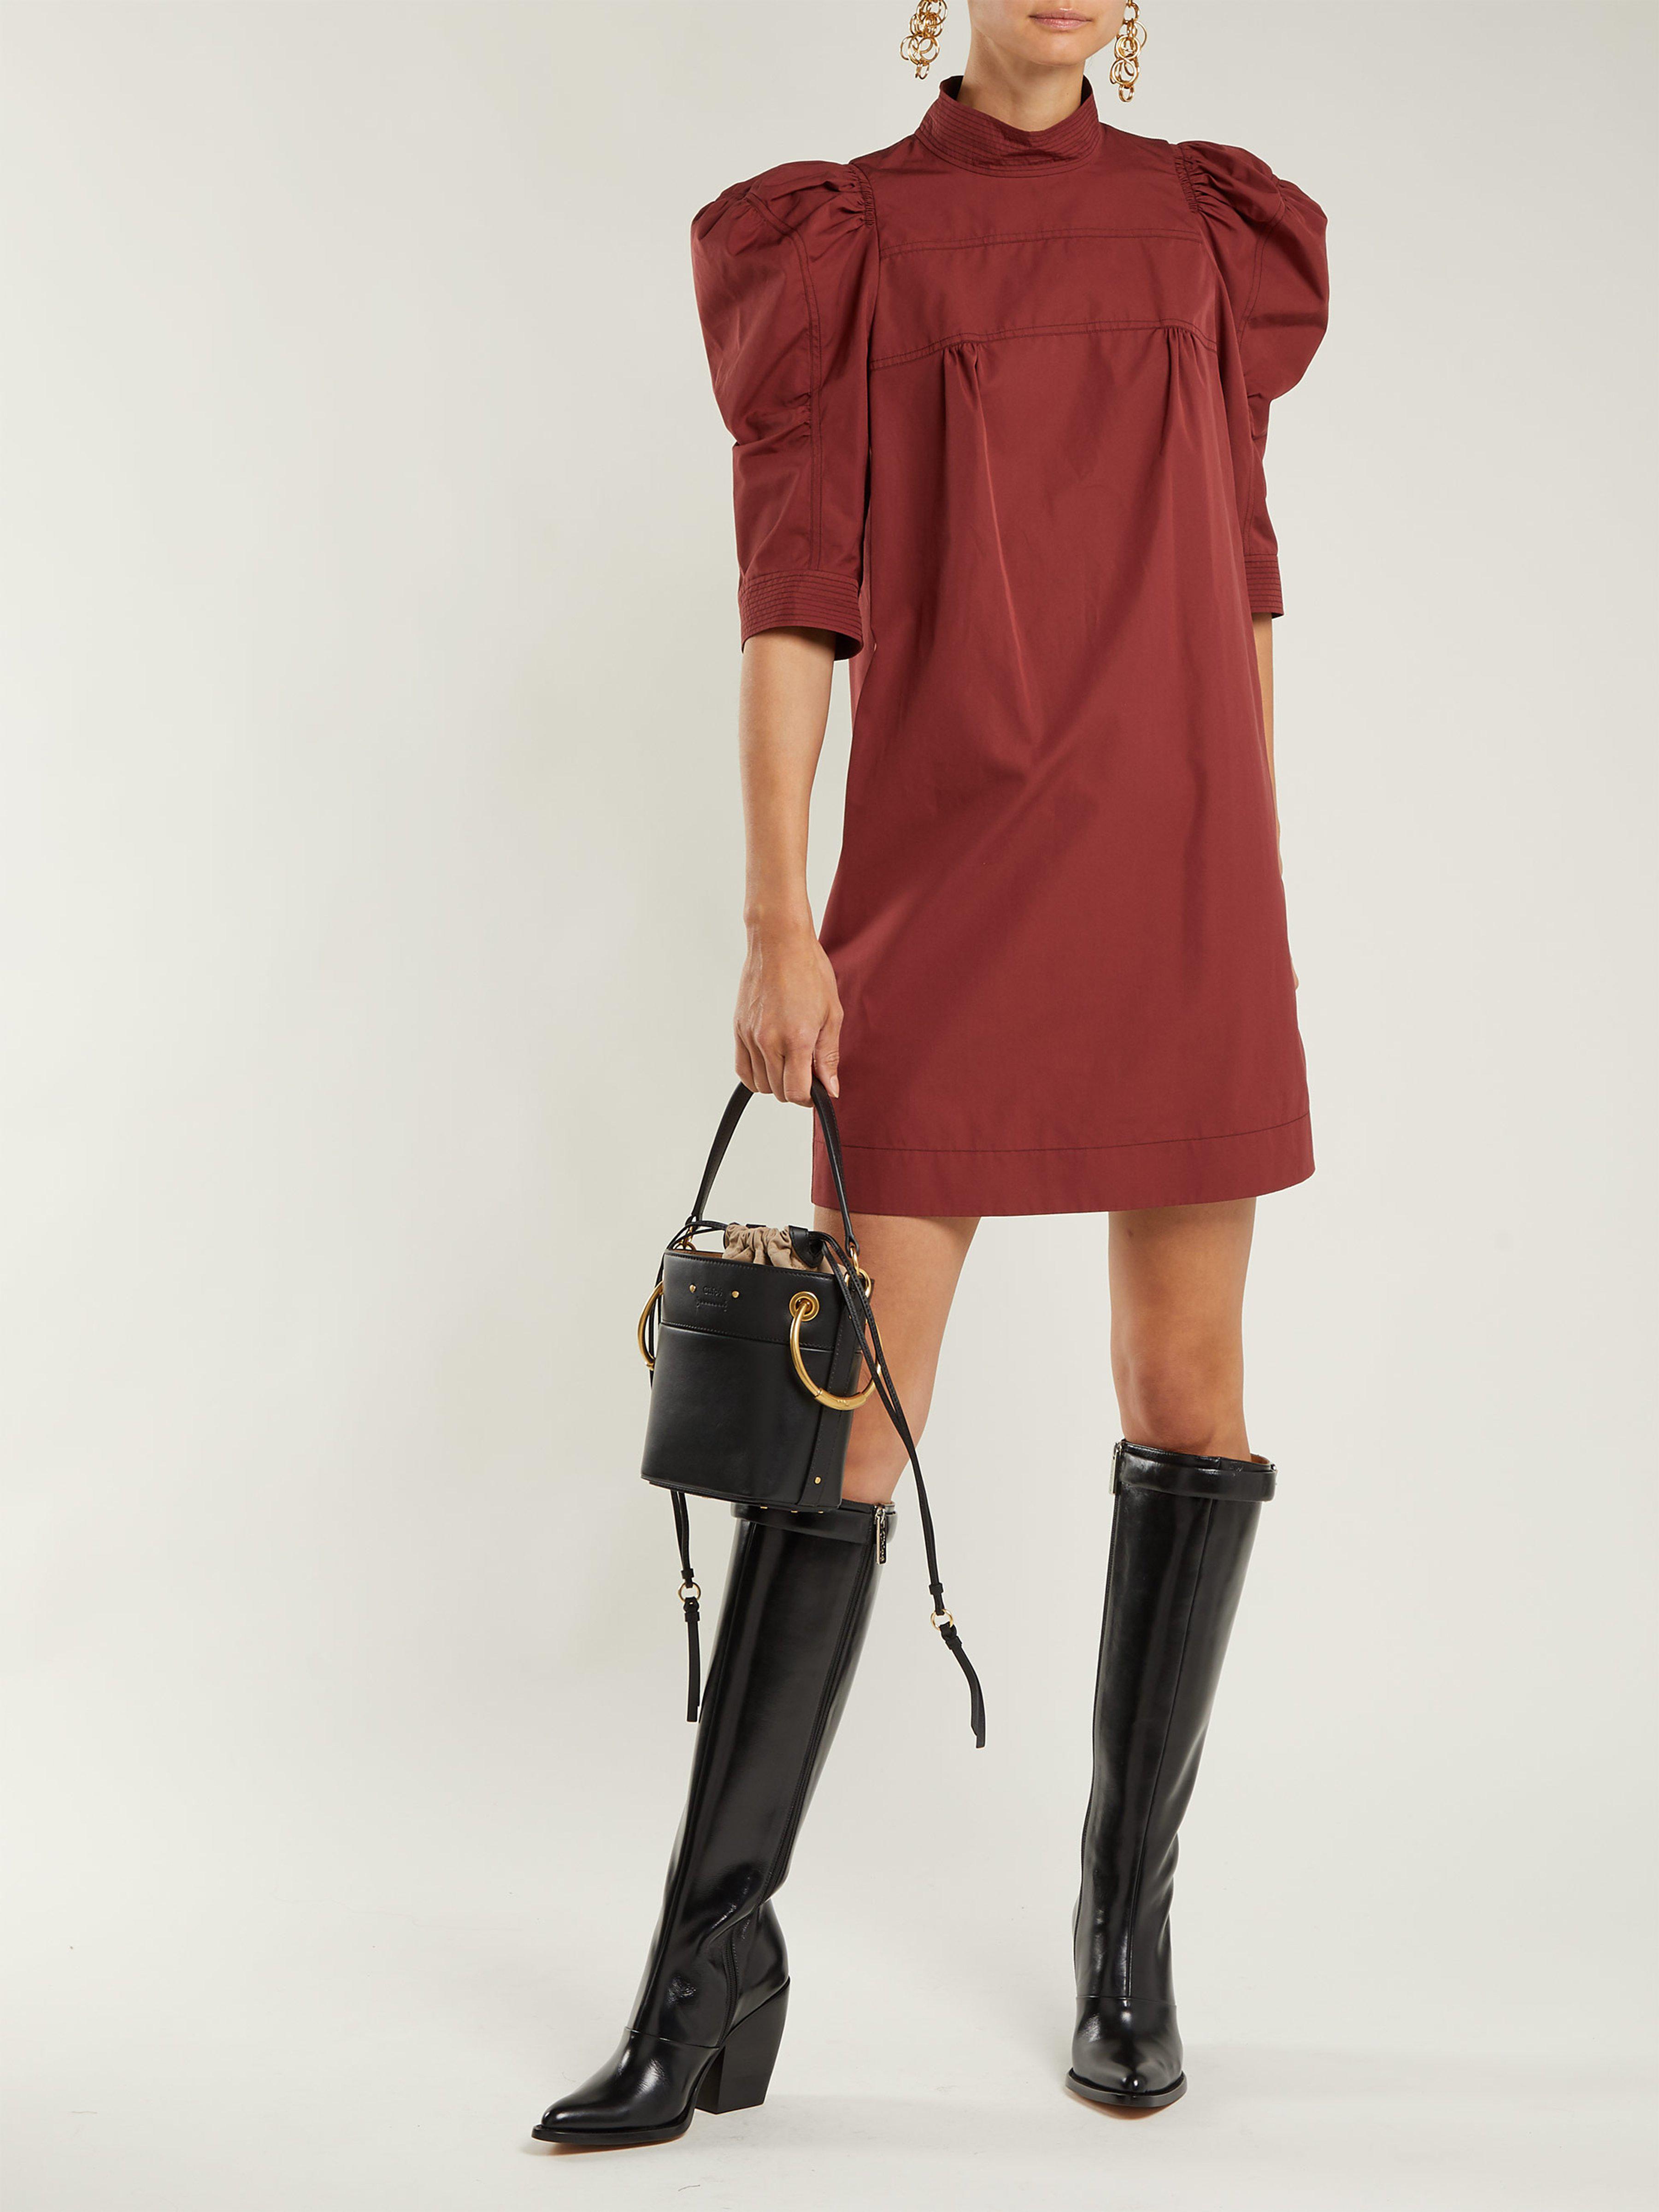 Chloé - Black Roy Mini Leather Bucket Bag - Lyst. View fullscreen 7879f0dbbf946